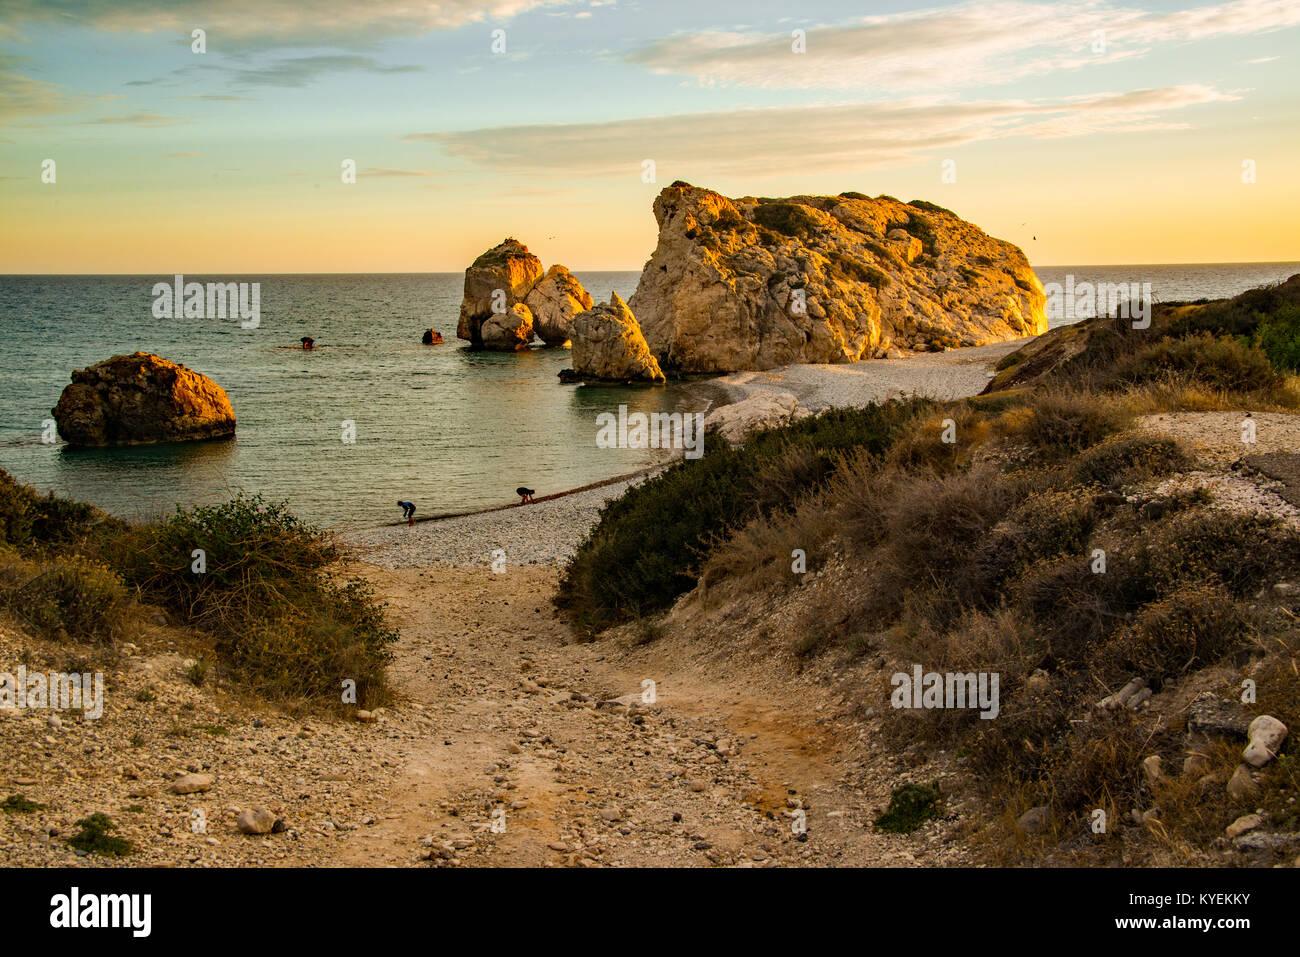 Rock of Aphrodite, Cyprus - Stock Image